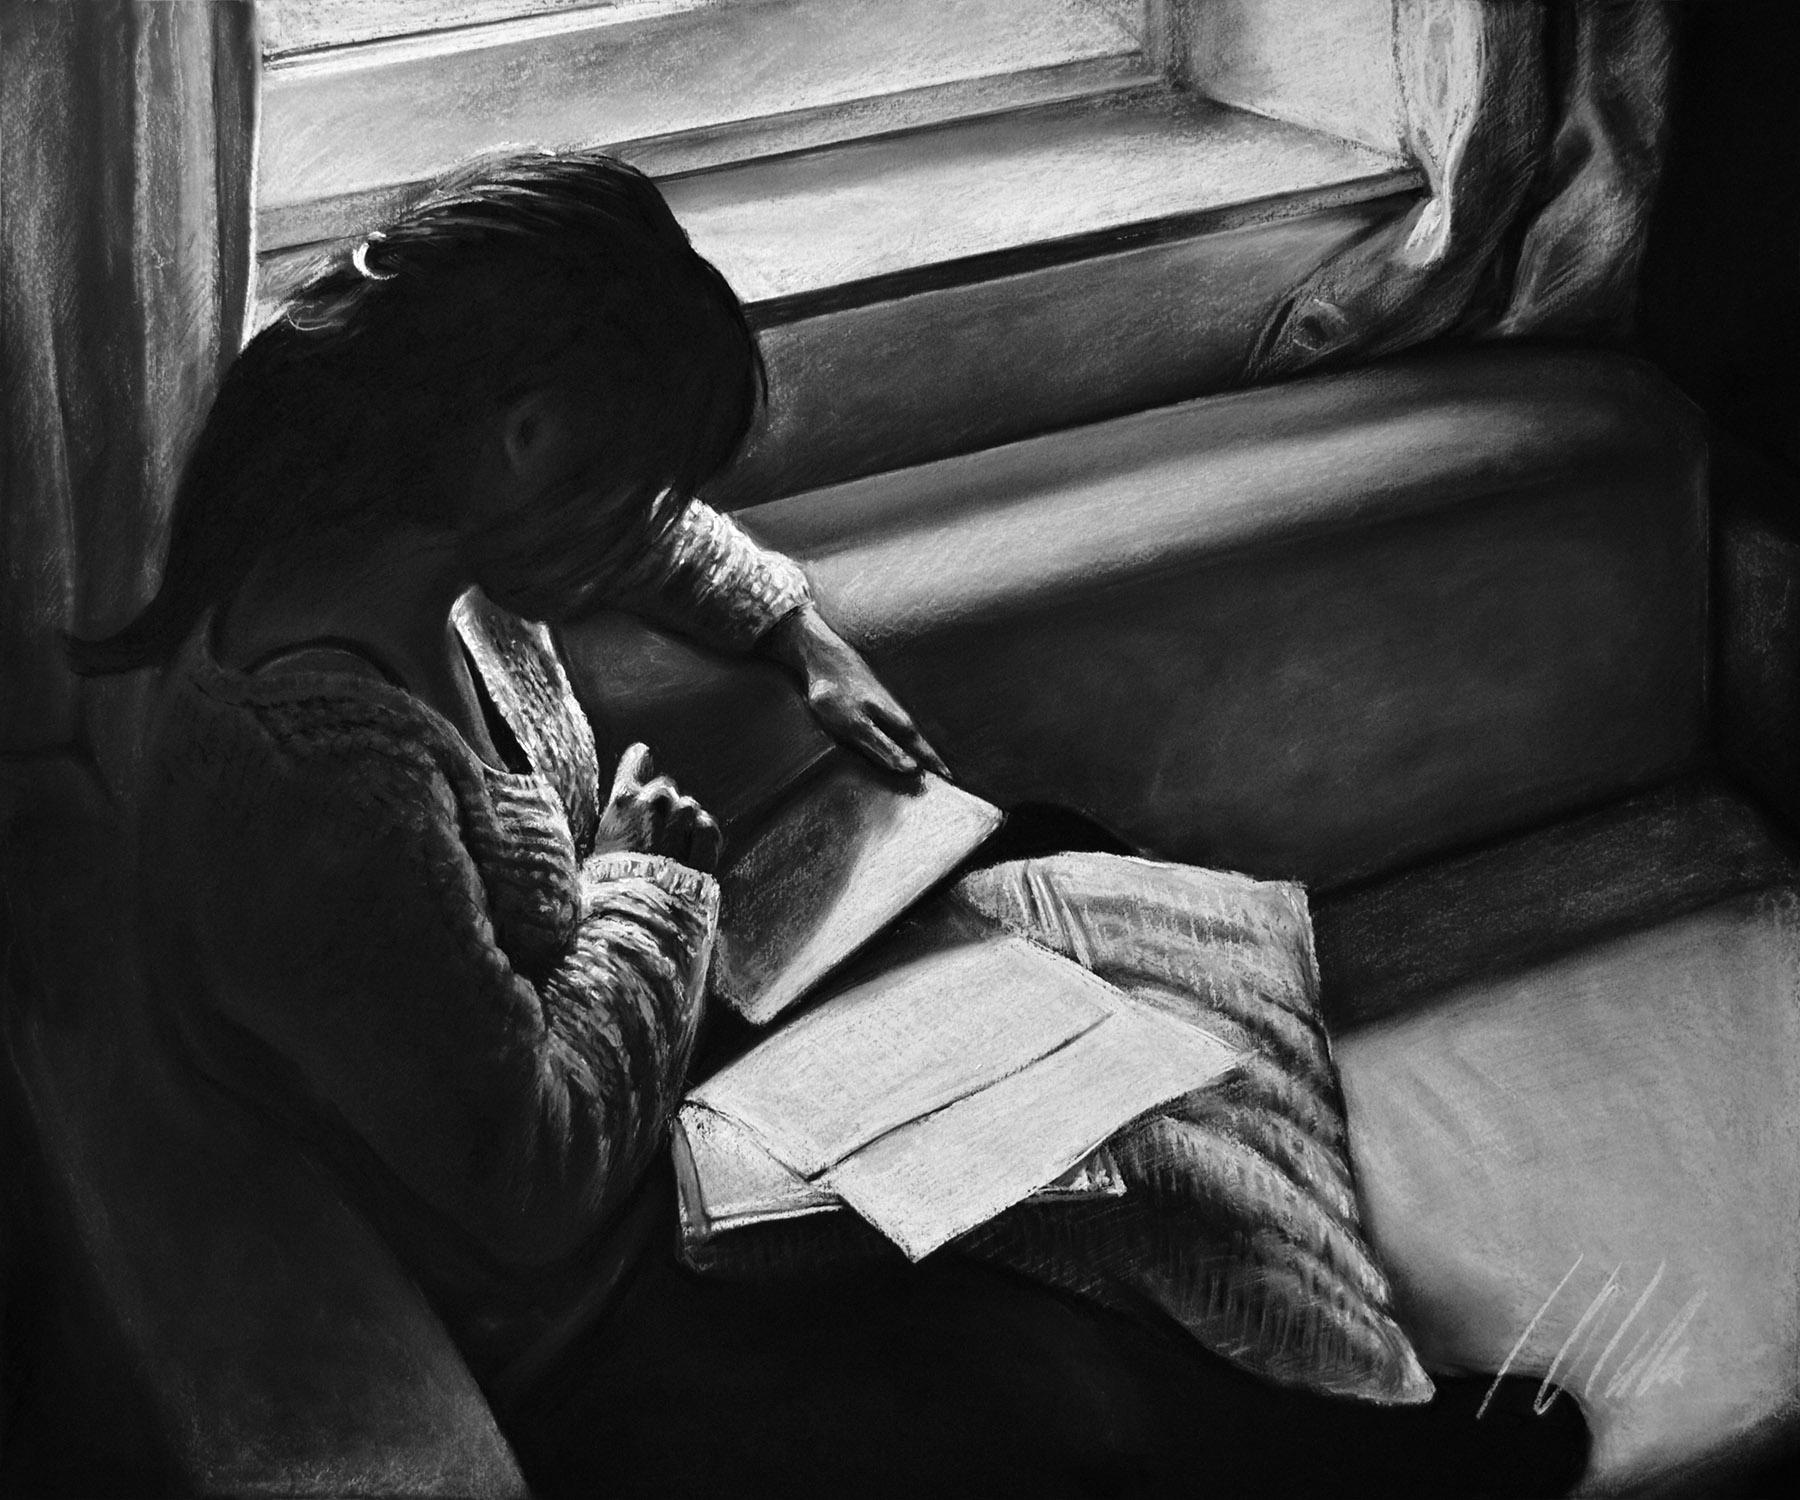 Junto a la ventana. Pastel, 60 x 50cm. Javier Olmedo, año 2015.